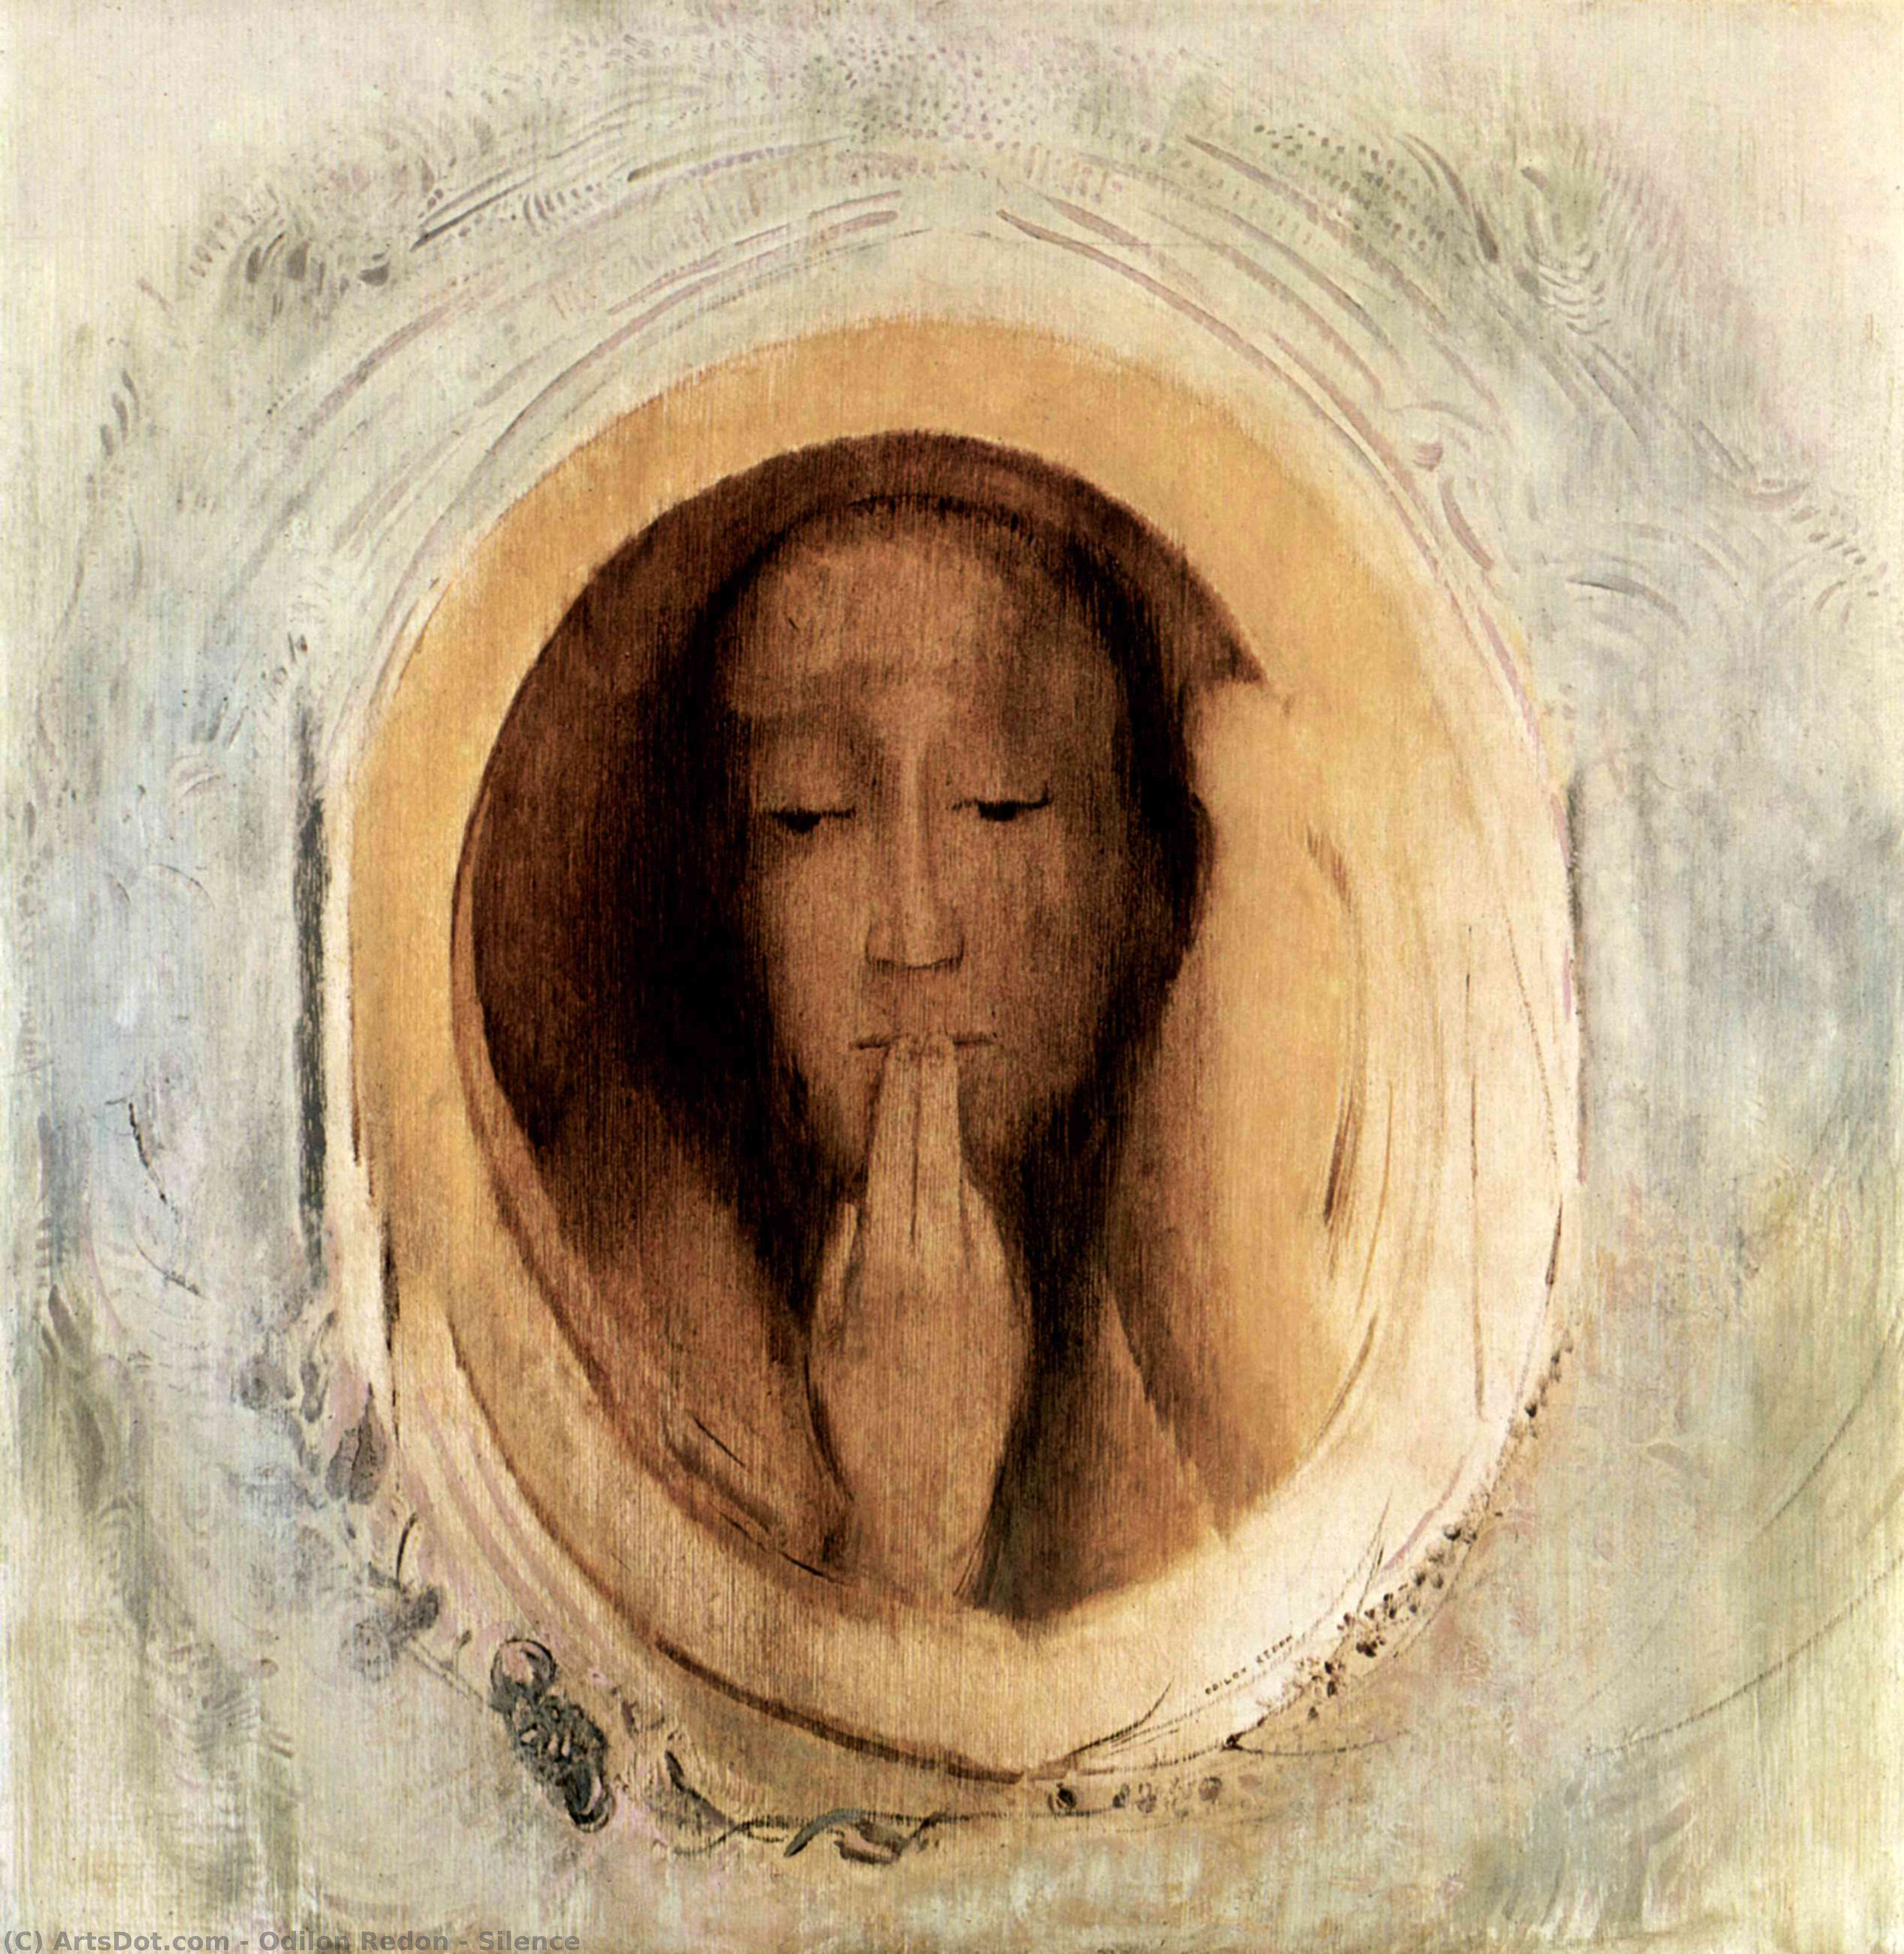 Wikoo.org - موسوعة الفنون الجميلة - اللوحة، العمل الفني Odilon Redon - Silence